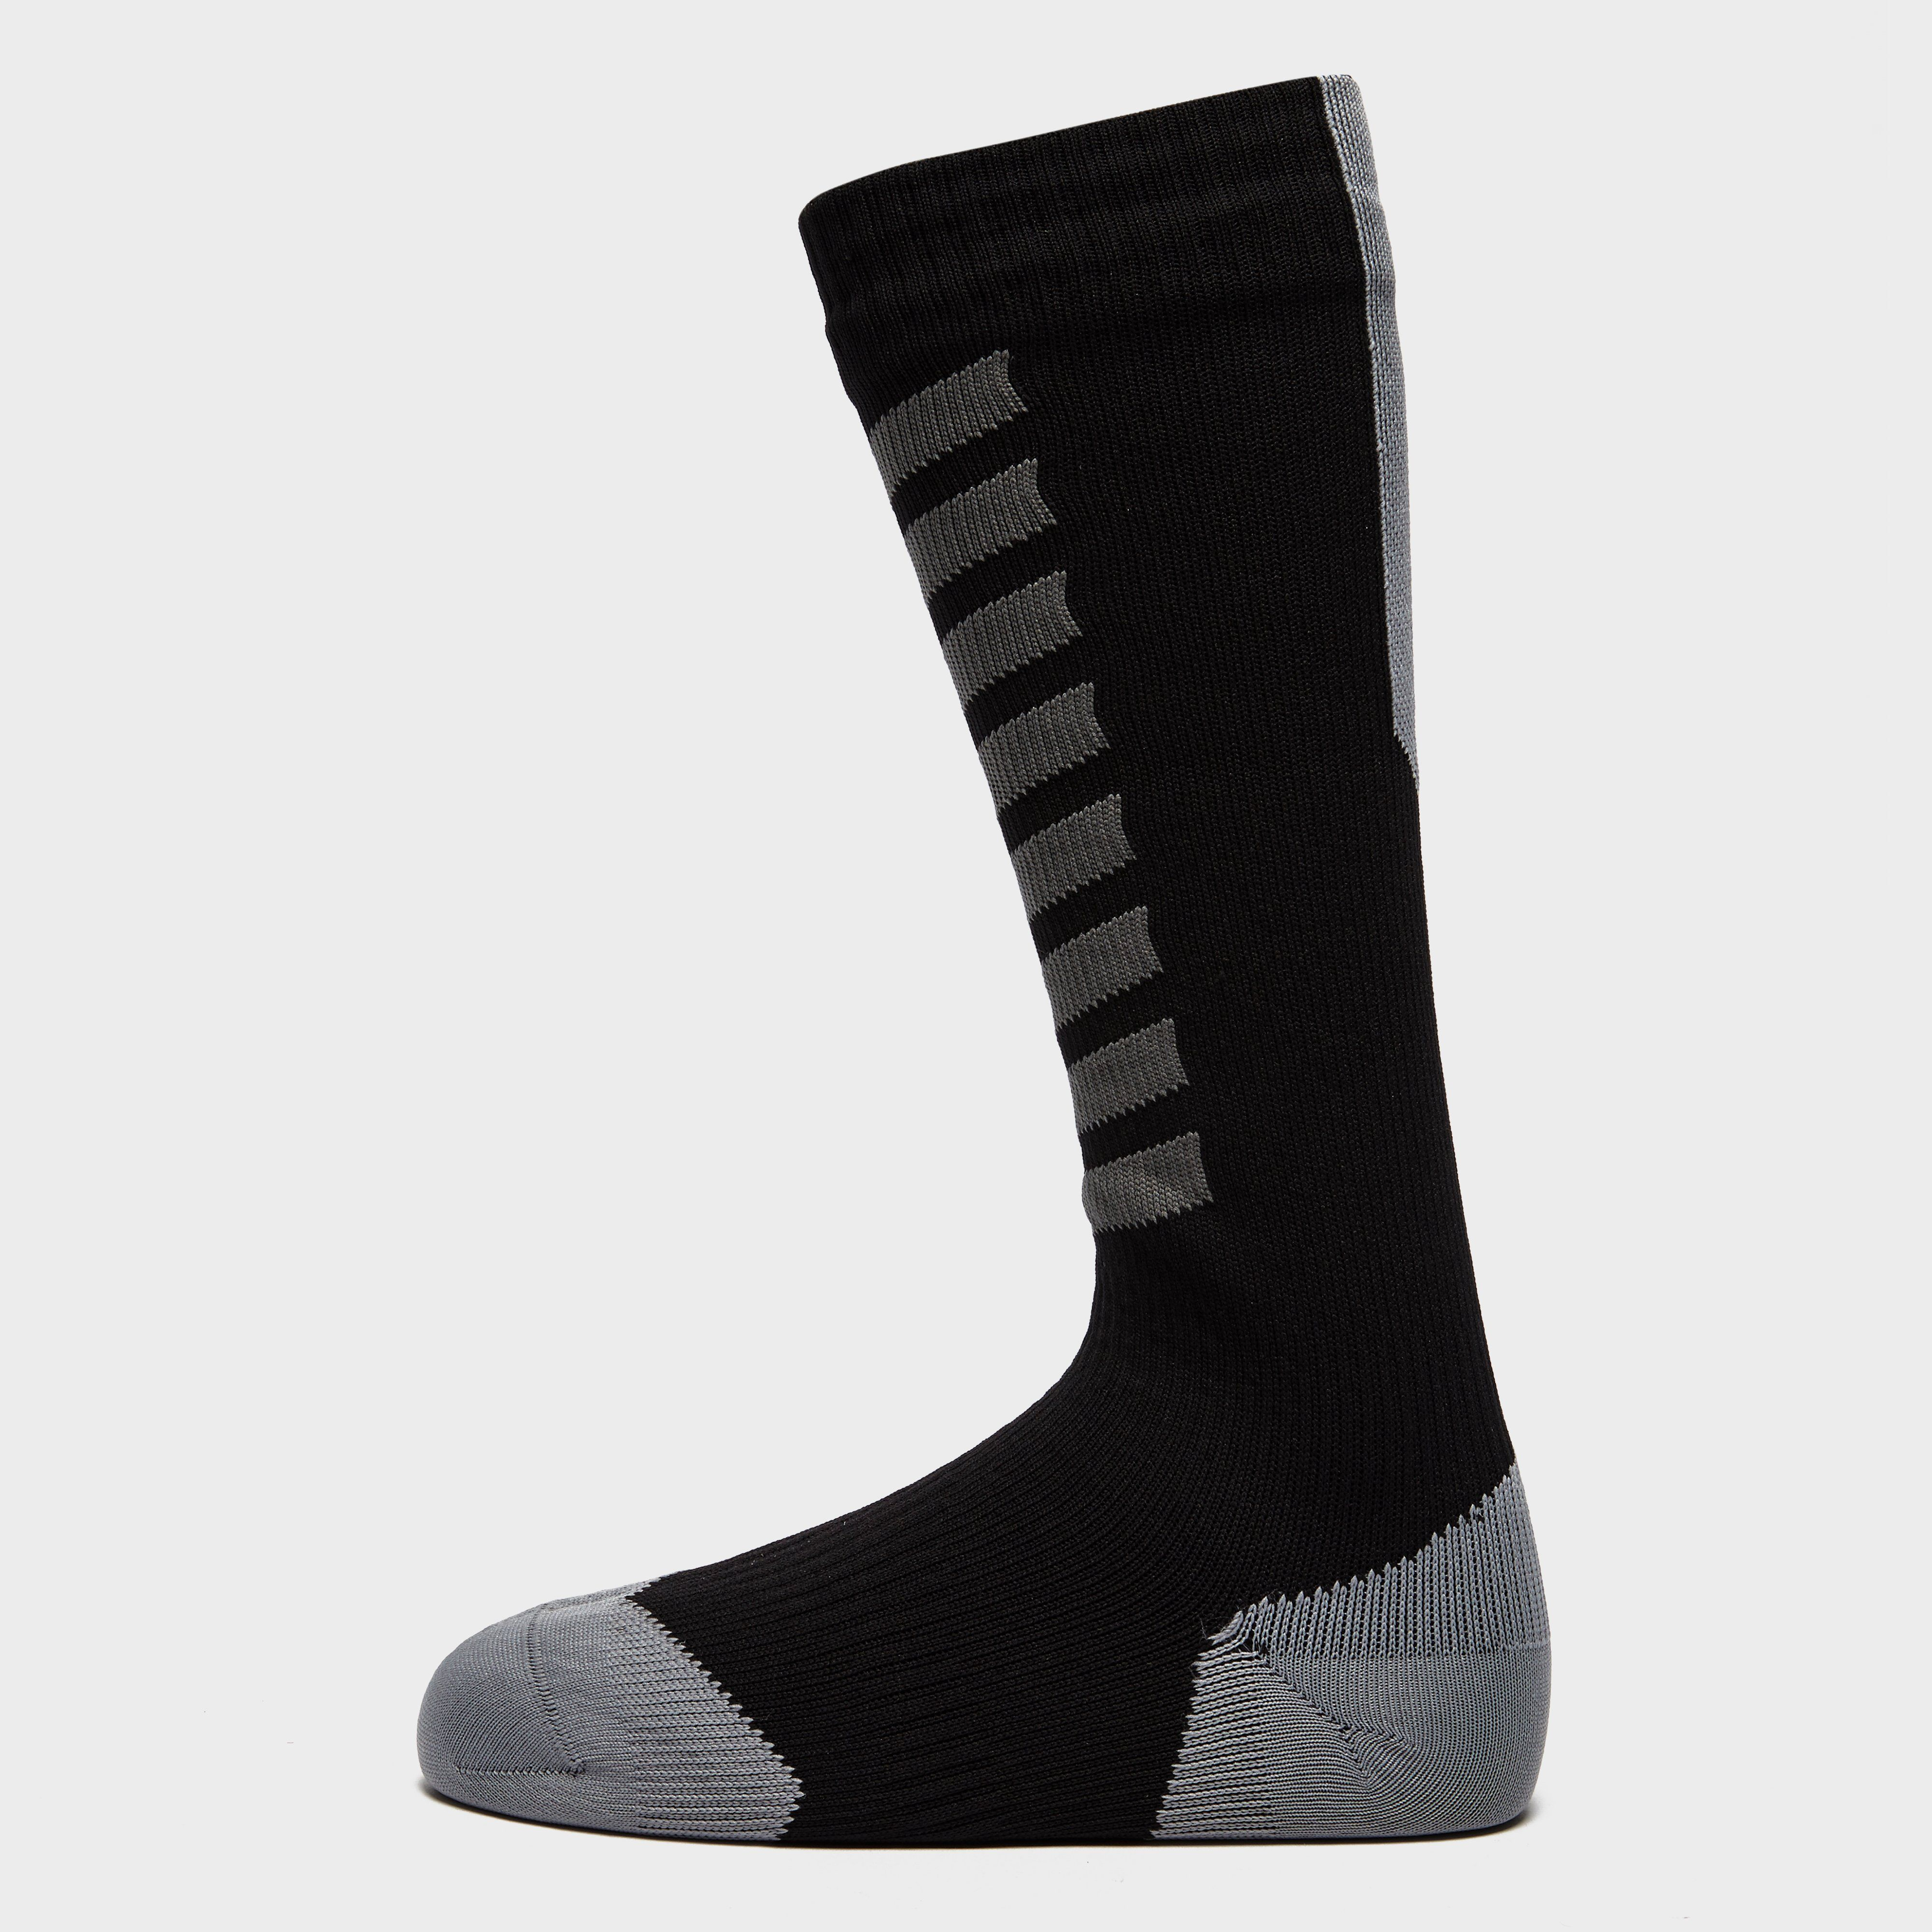 SEALSKINZ Mountain Bike Knee Length Socks